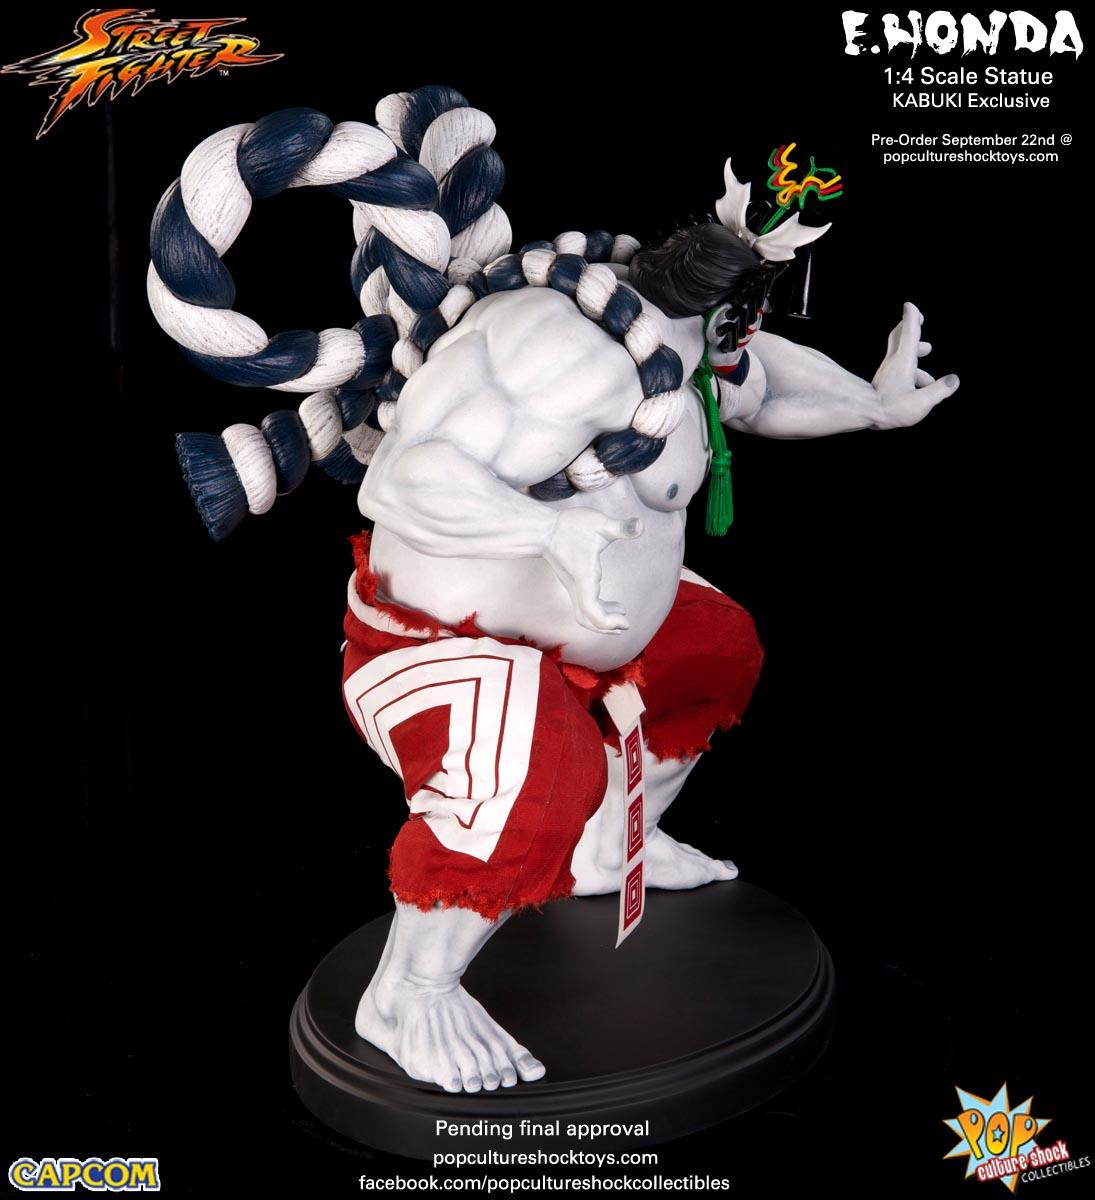 [Pop Culture Shock] Street Fighter: E. Honda 1/4 Statue - Página 3 Street-Fighter-E.-Honda-Kabuki-Statue-015